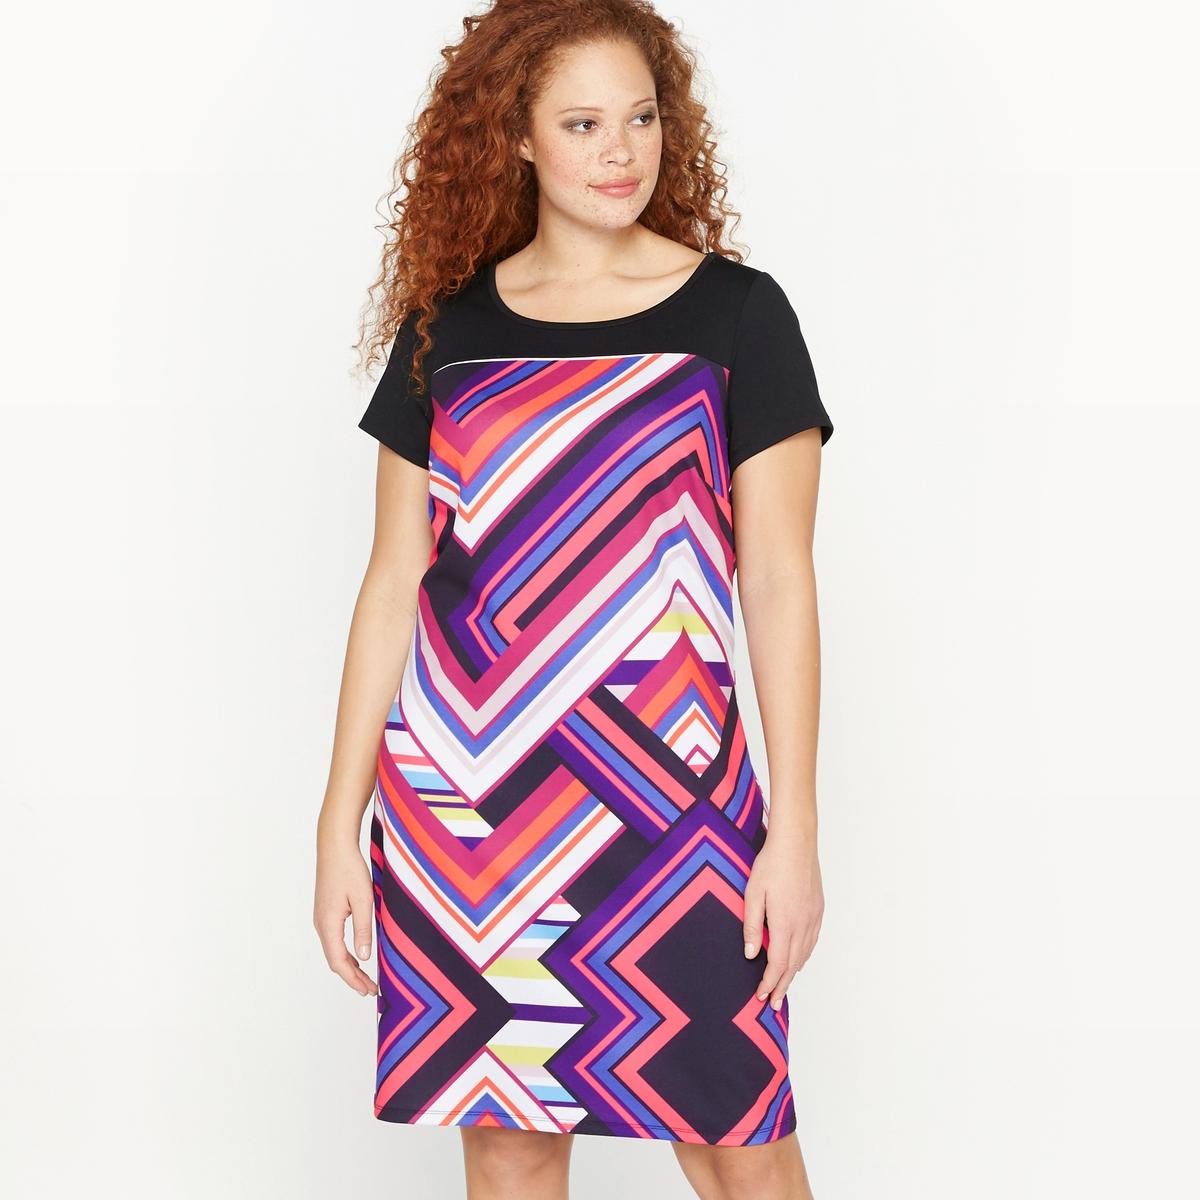 Платье прямого покроя из трикотажа с рисунком платье прямого покроя с короткими рукавами и рисунком